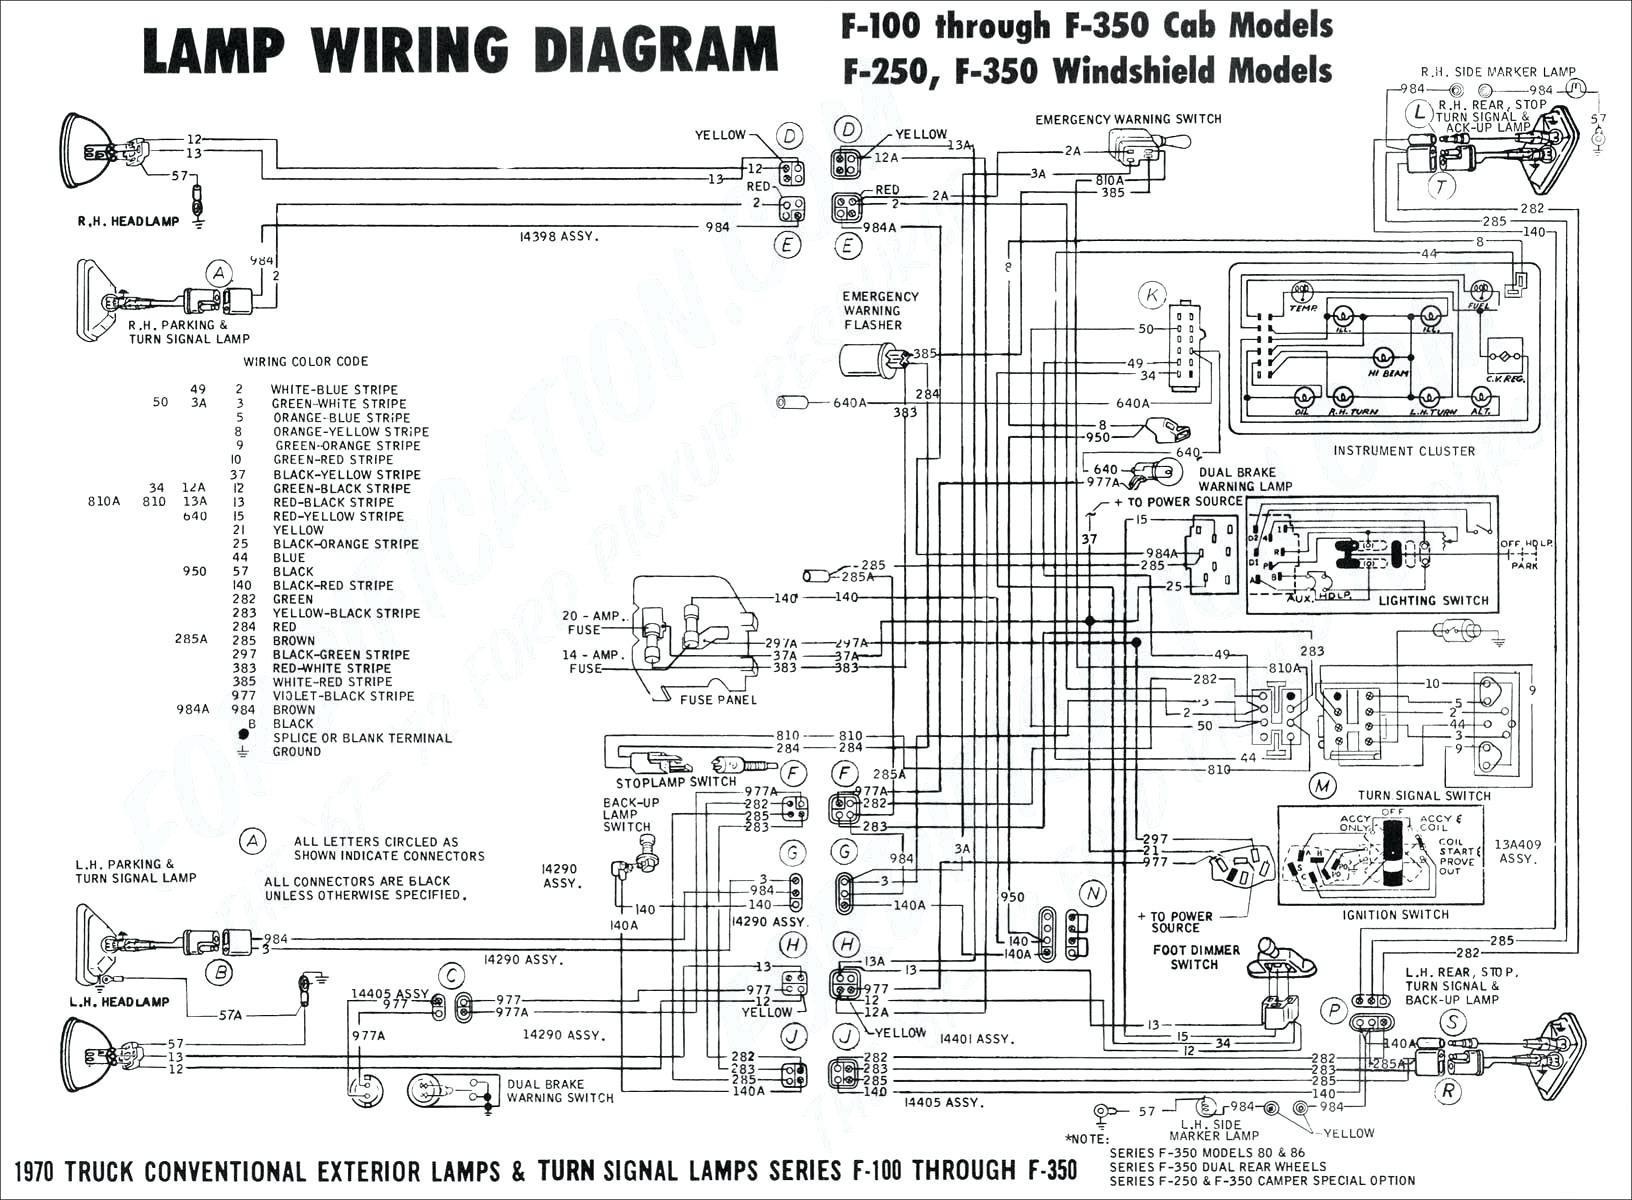 Xbox 360 Psu Wiring Diagram asco 962 Wiring Diagram Of Xbox 360 Psu Wiring Diagram